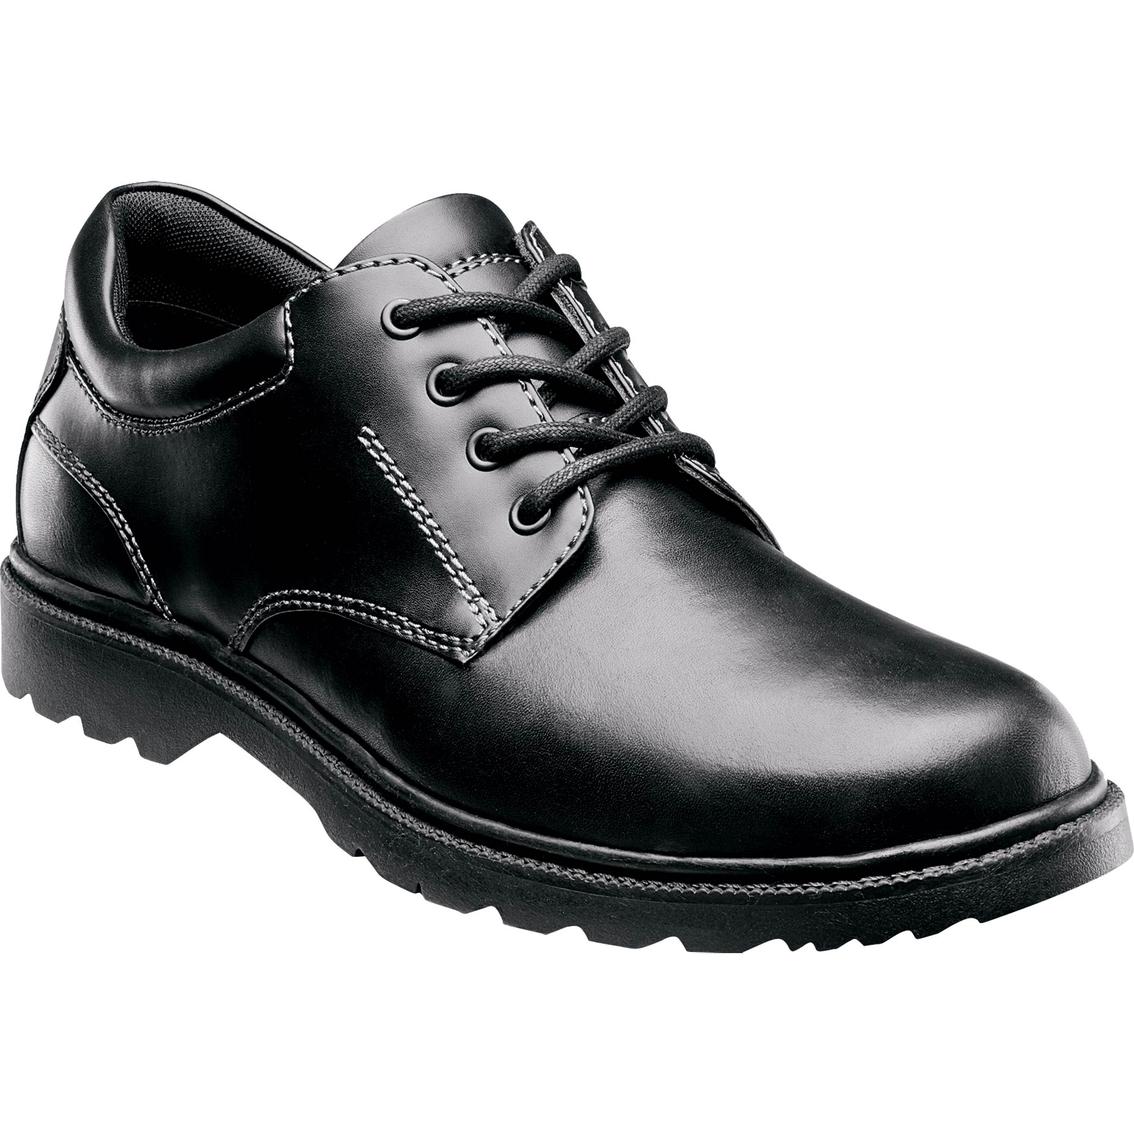 Nunn Bush Mens Stillwater Waterproof Leather Dress Casual Oxford Shoes